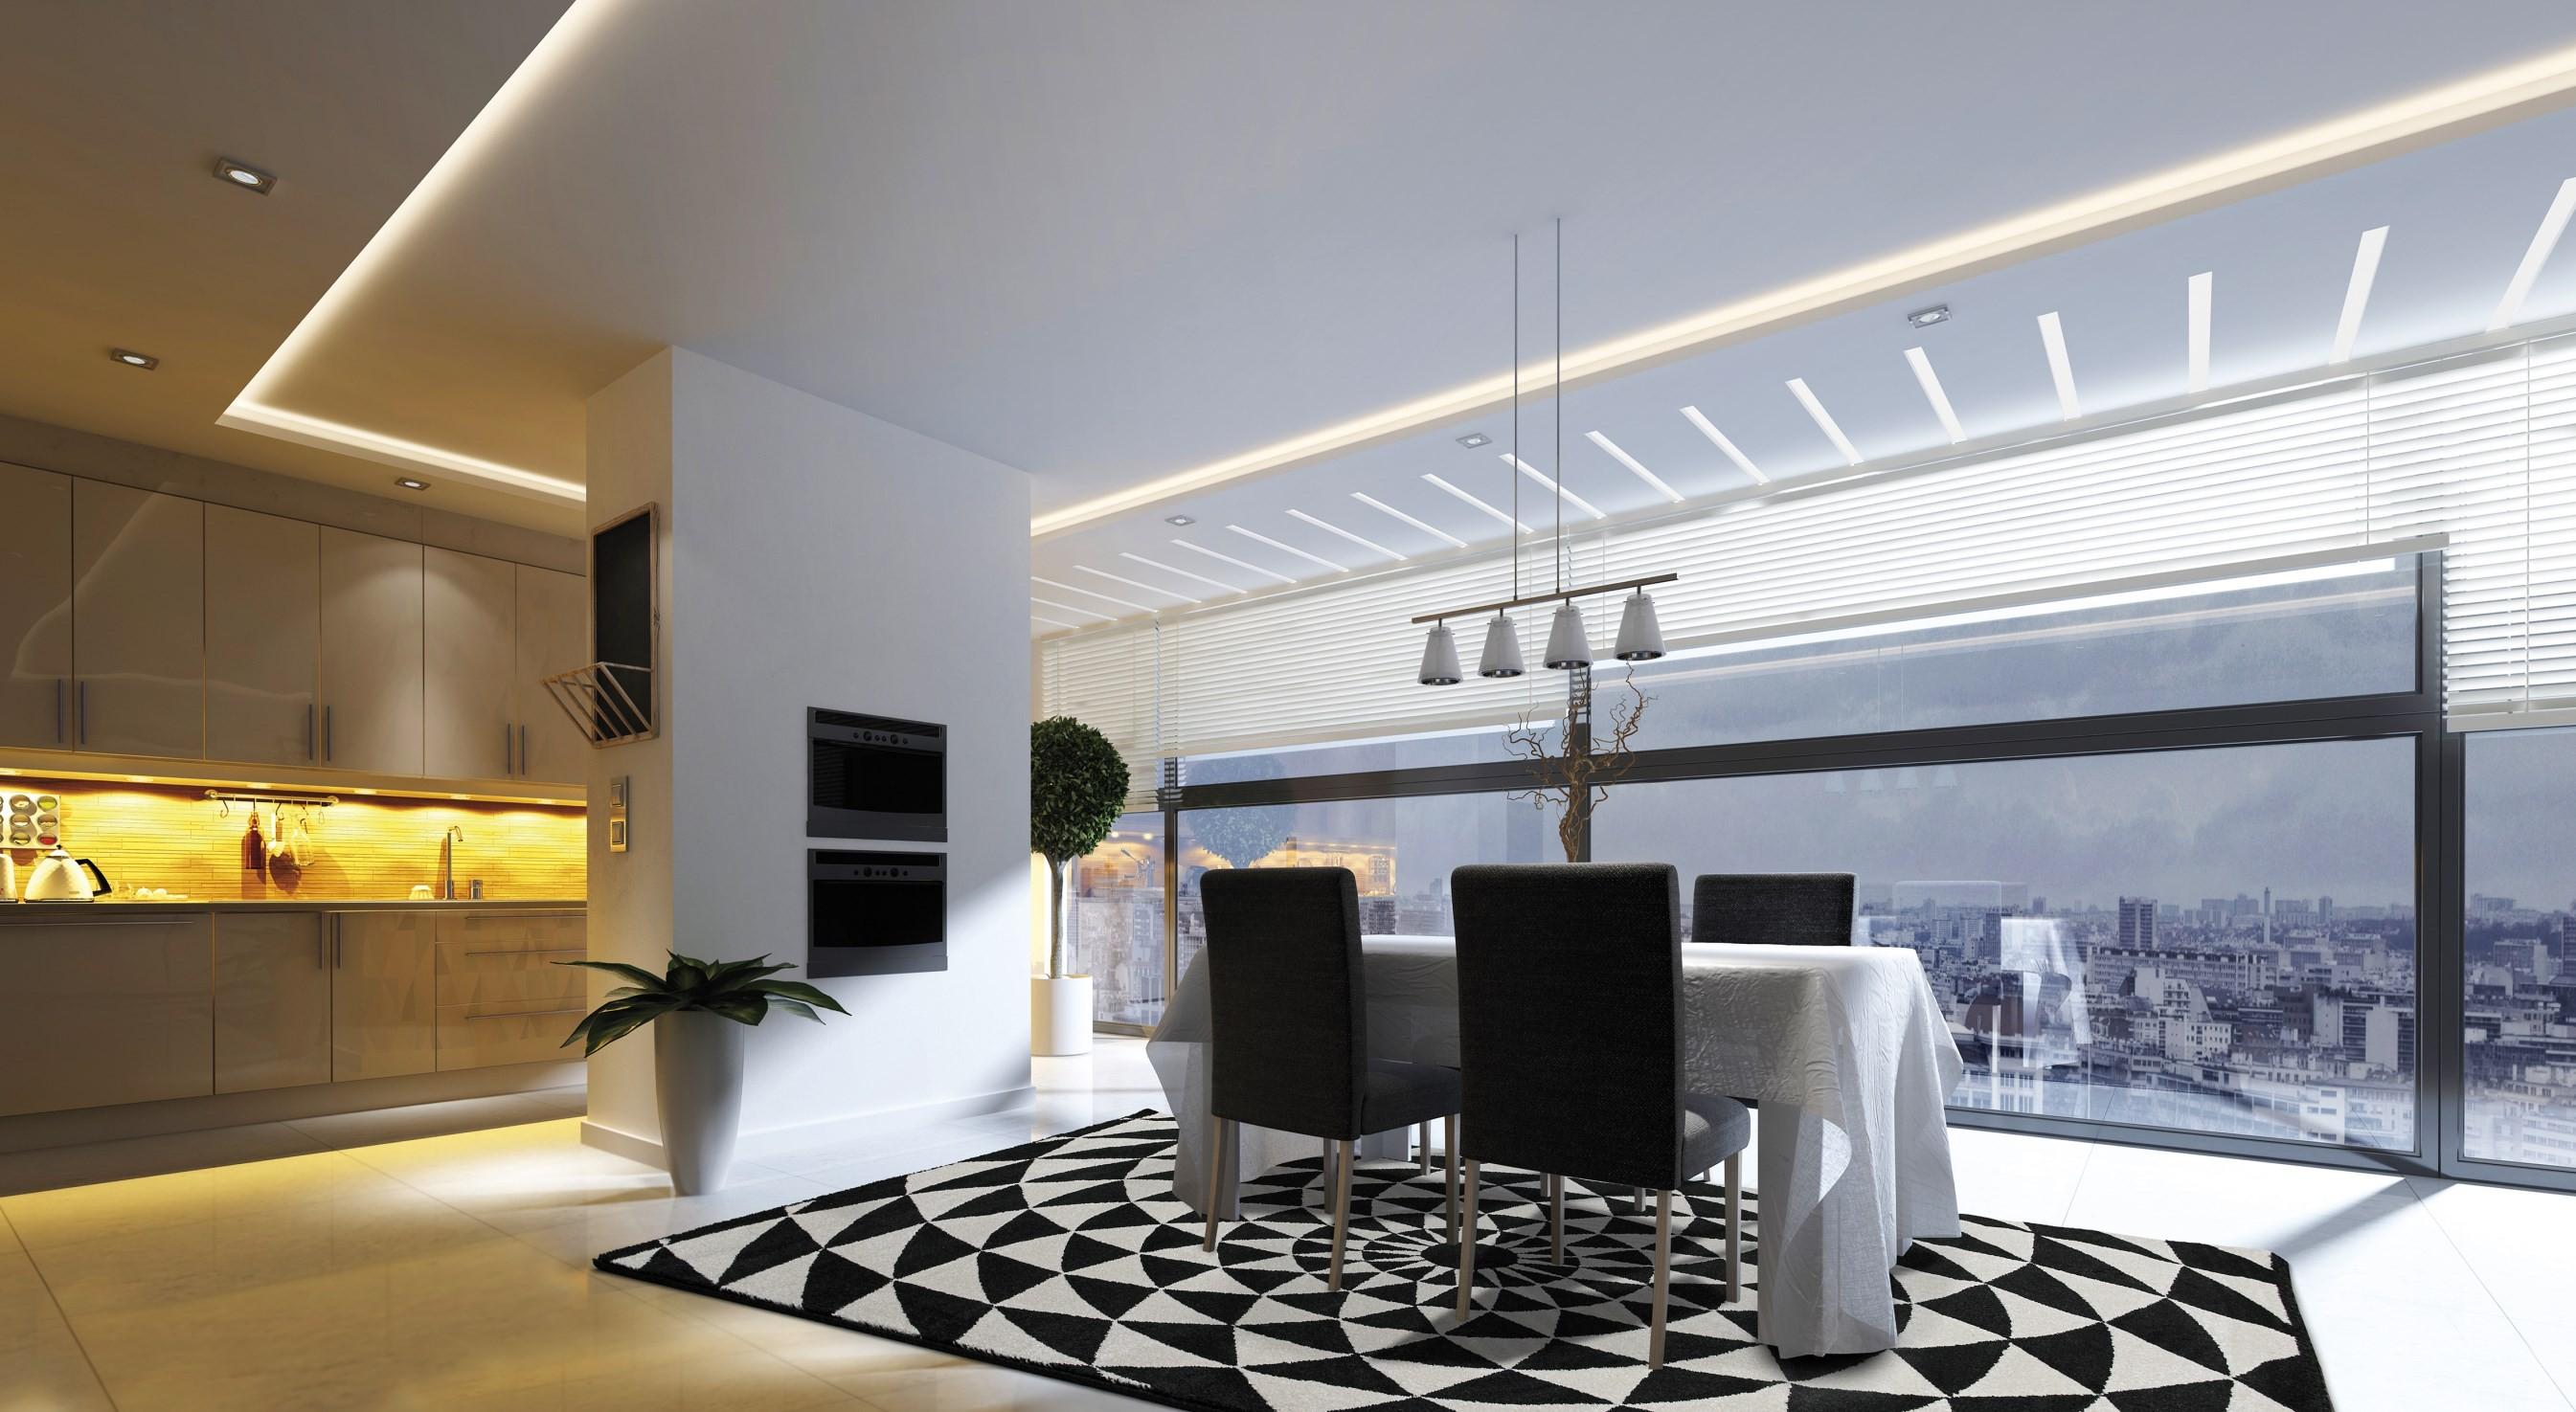 Biancaneve tappeto rettangolare a motivi geometrici bianco e nero